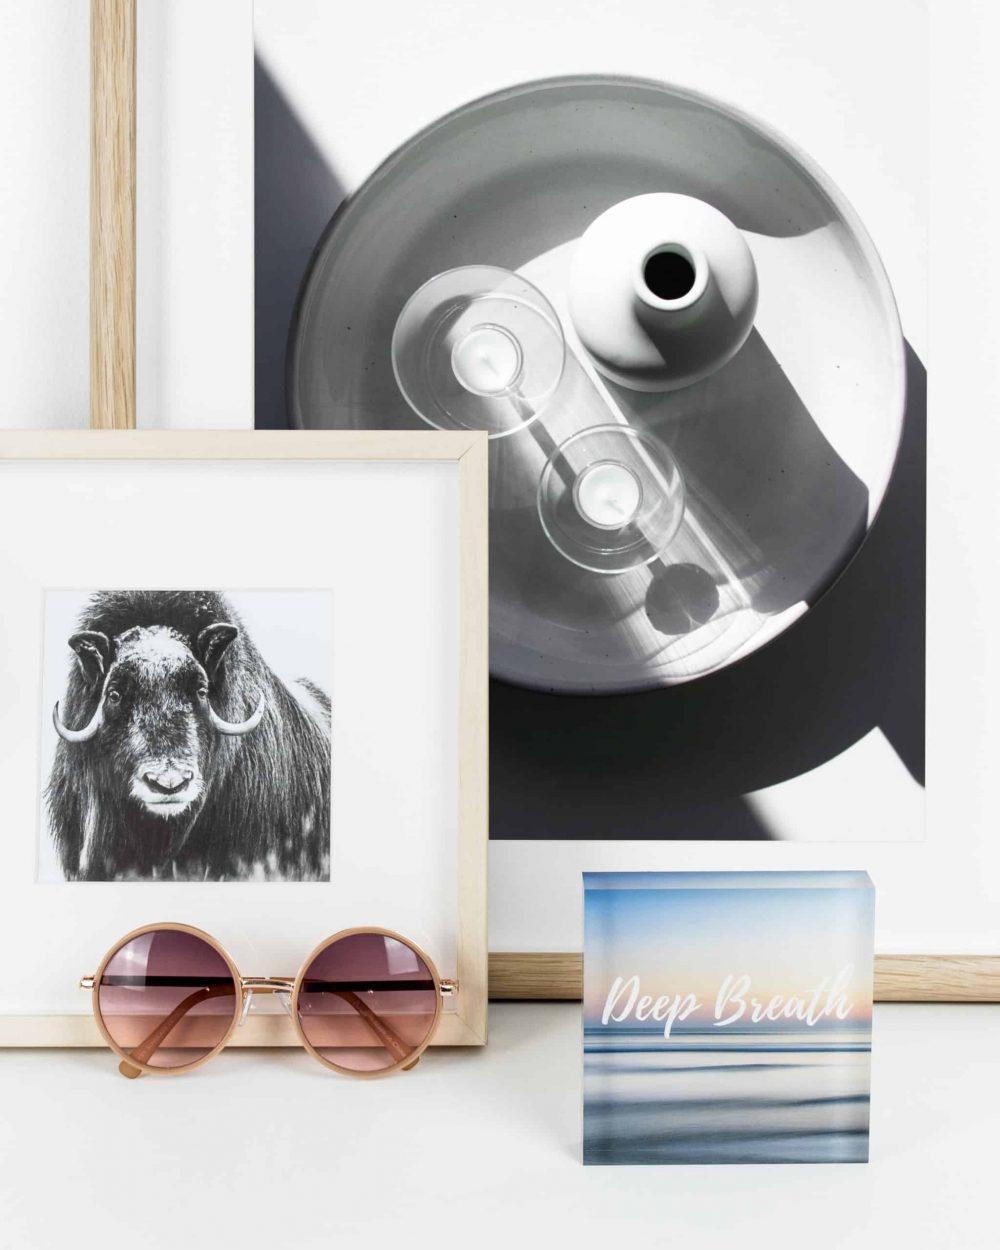 Styled product shot of inspirational acrylic block